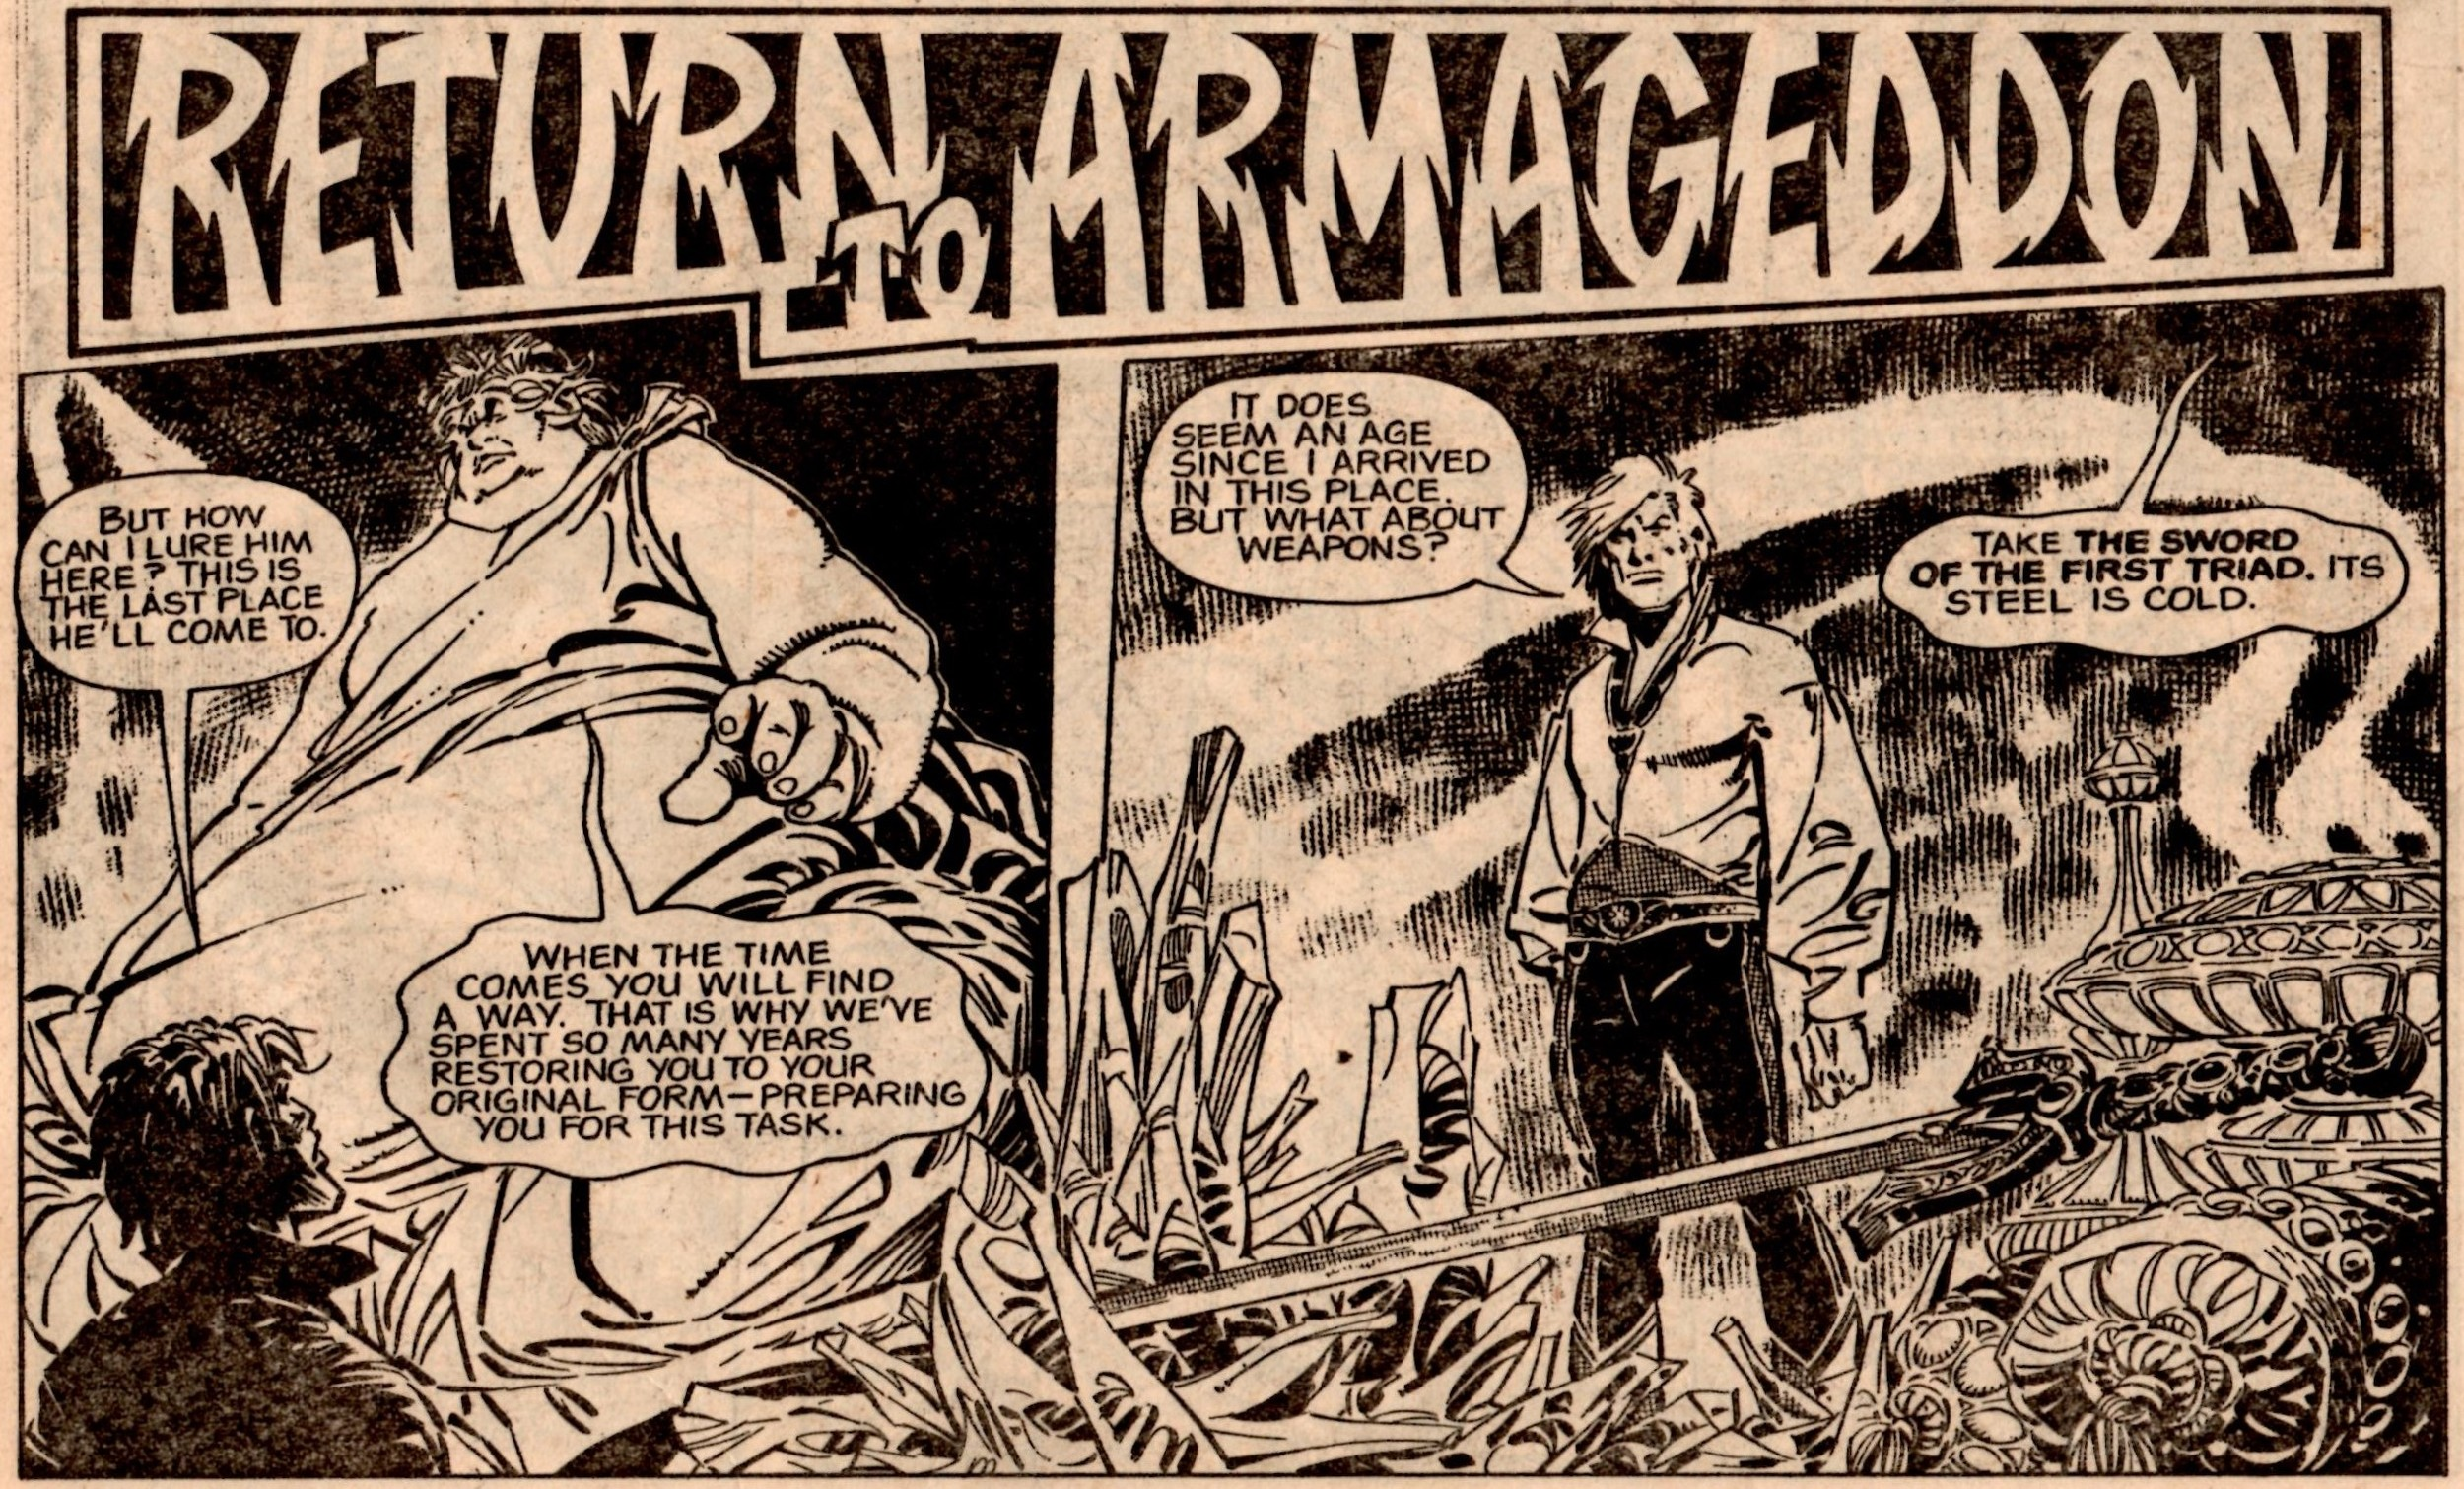 Return to Armageddon: Malcolm Shaw (writer), Jesus Redondo (artist)